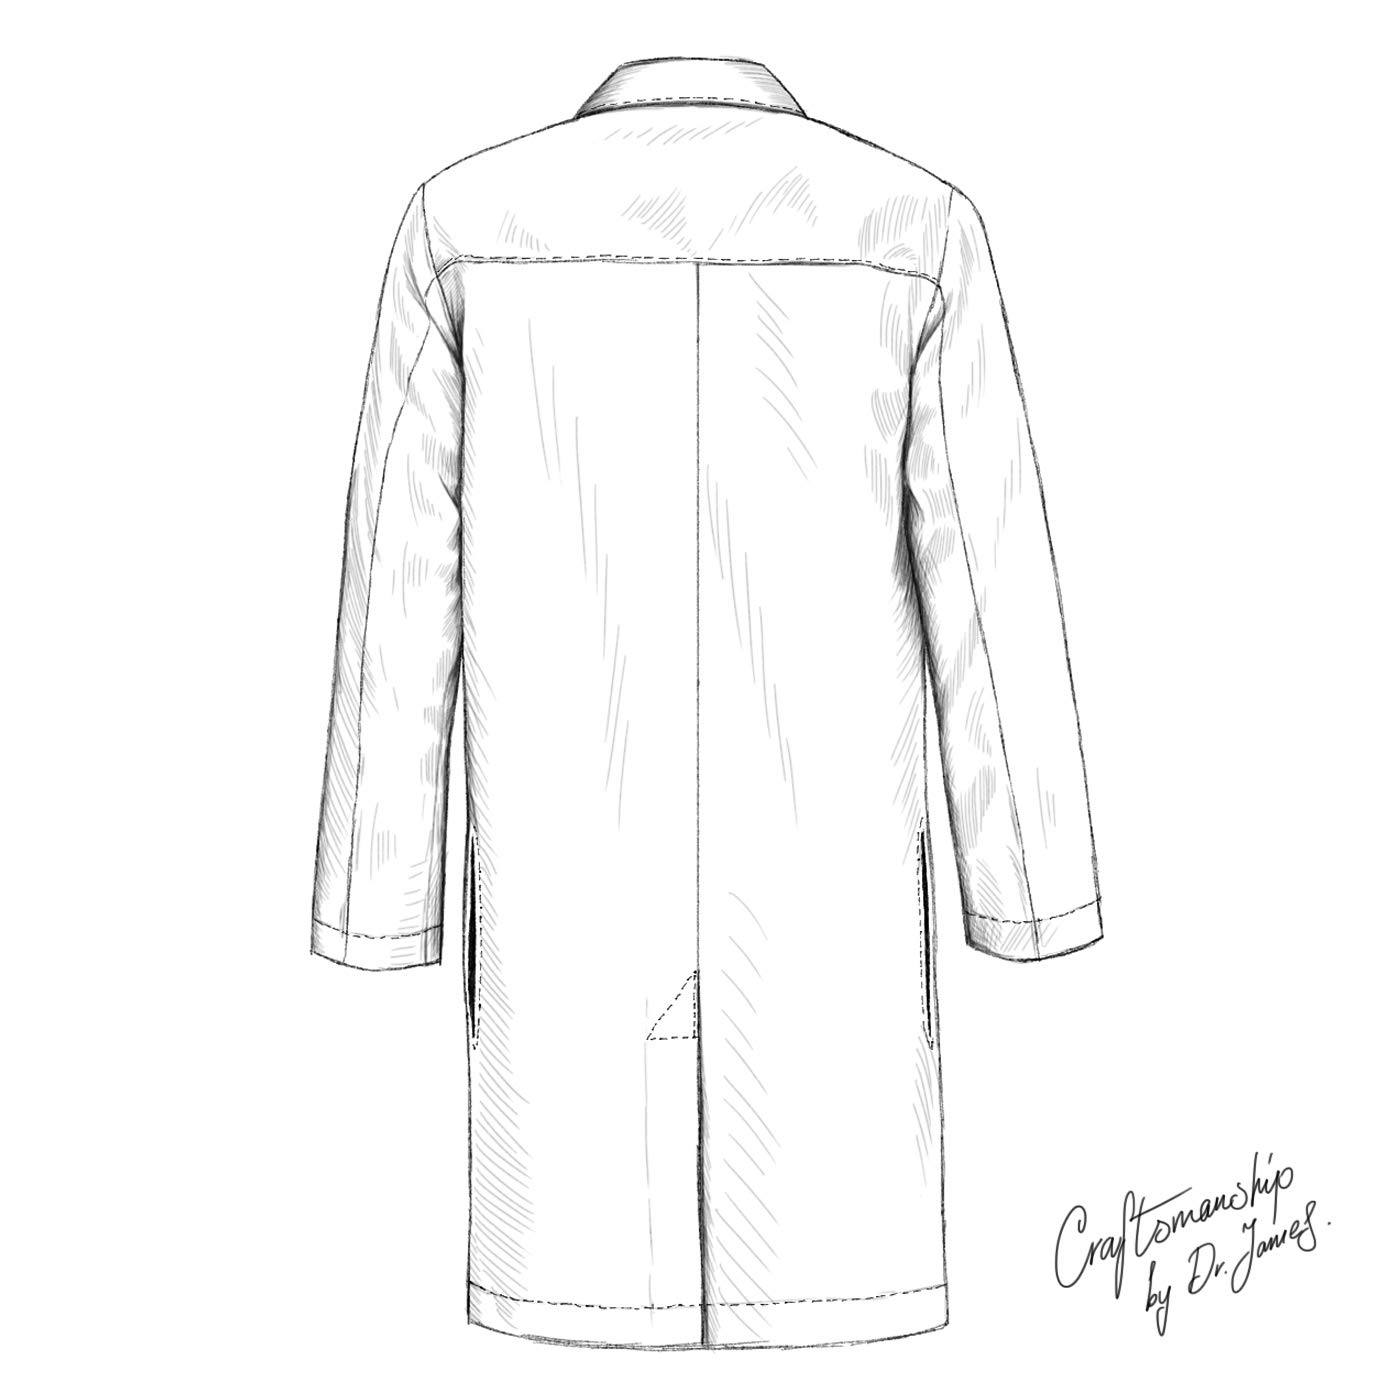 Dr. James Professionally Designed Unisex Lab Coat - 39 Inch Length US-01-2XS by Dr. James (Image #6)